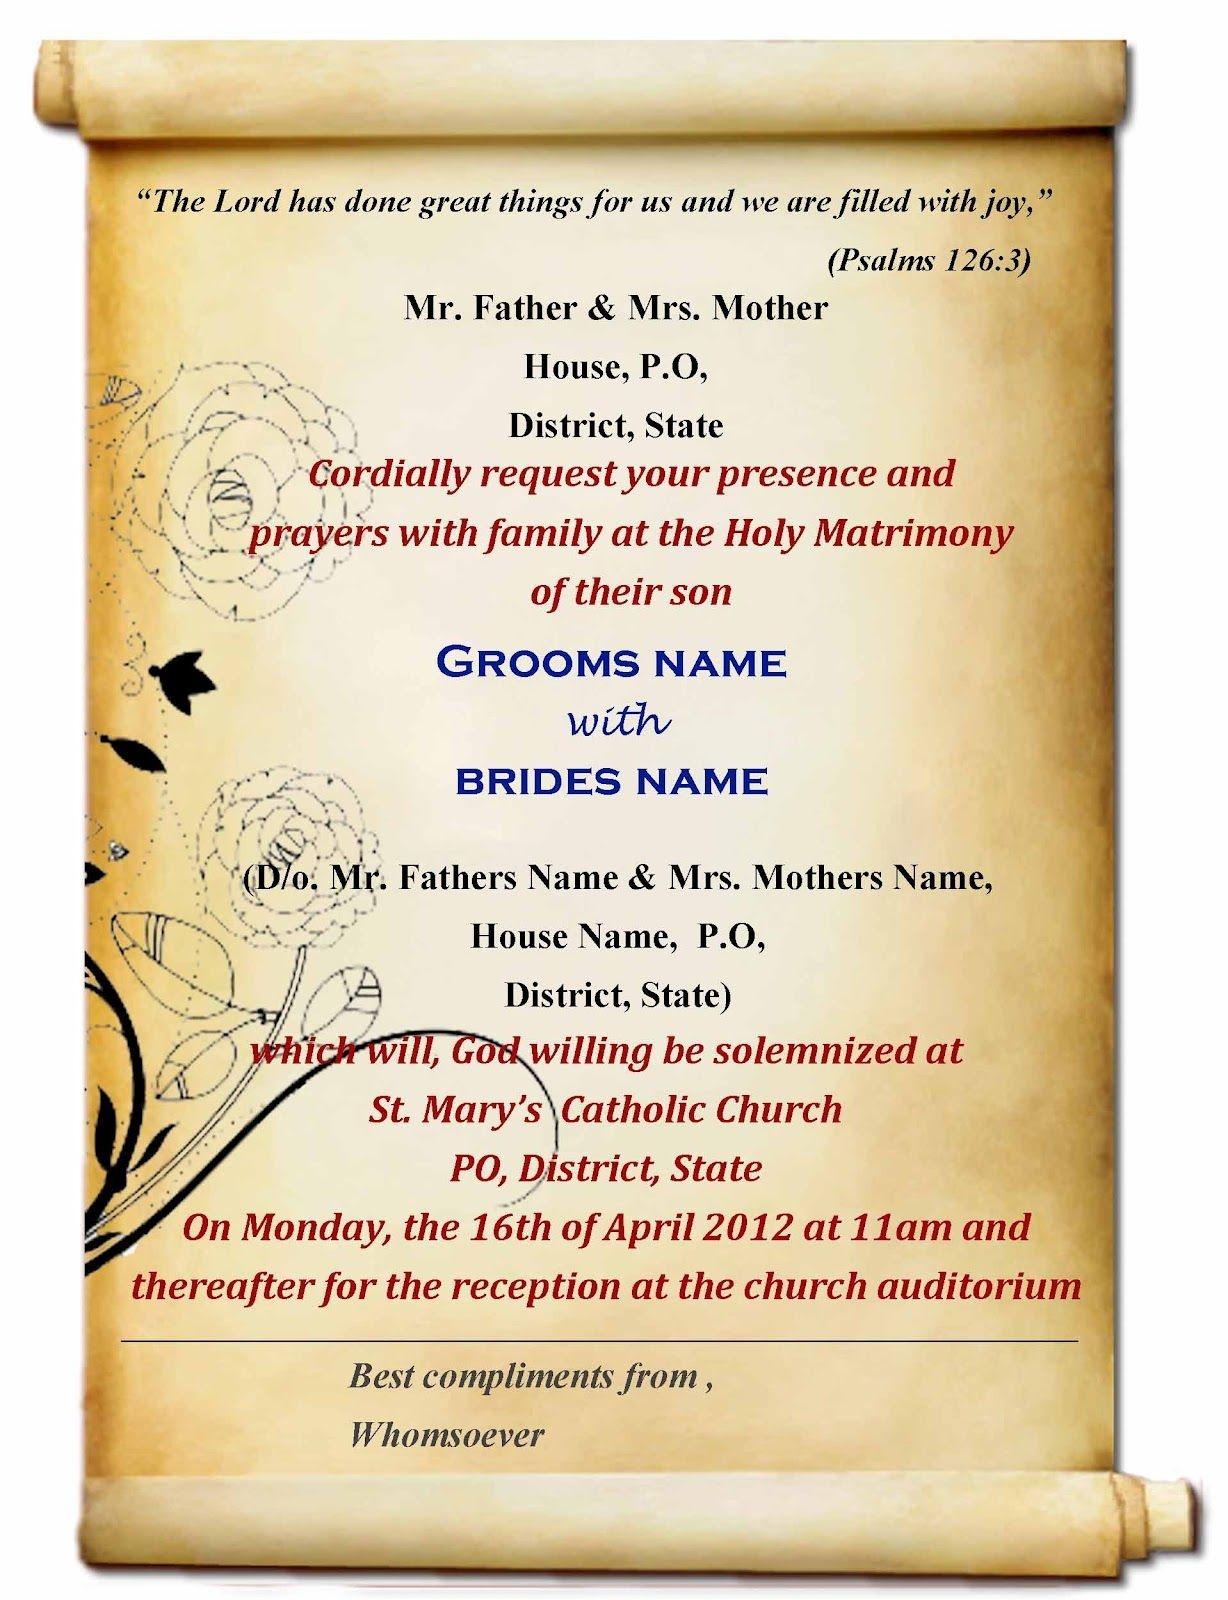 Free Wedding Invitation Card Template | I.d. Stuff | Free Wedding - Wedding Invitation Cards Printable Free